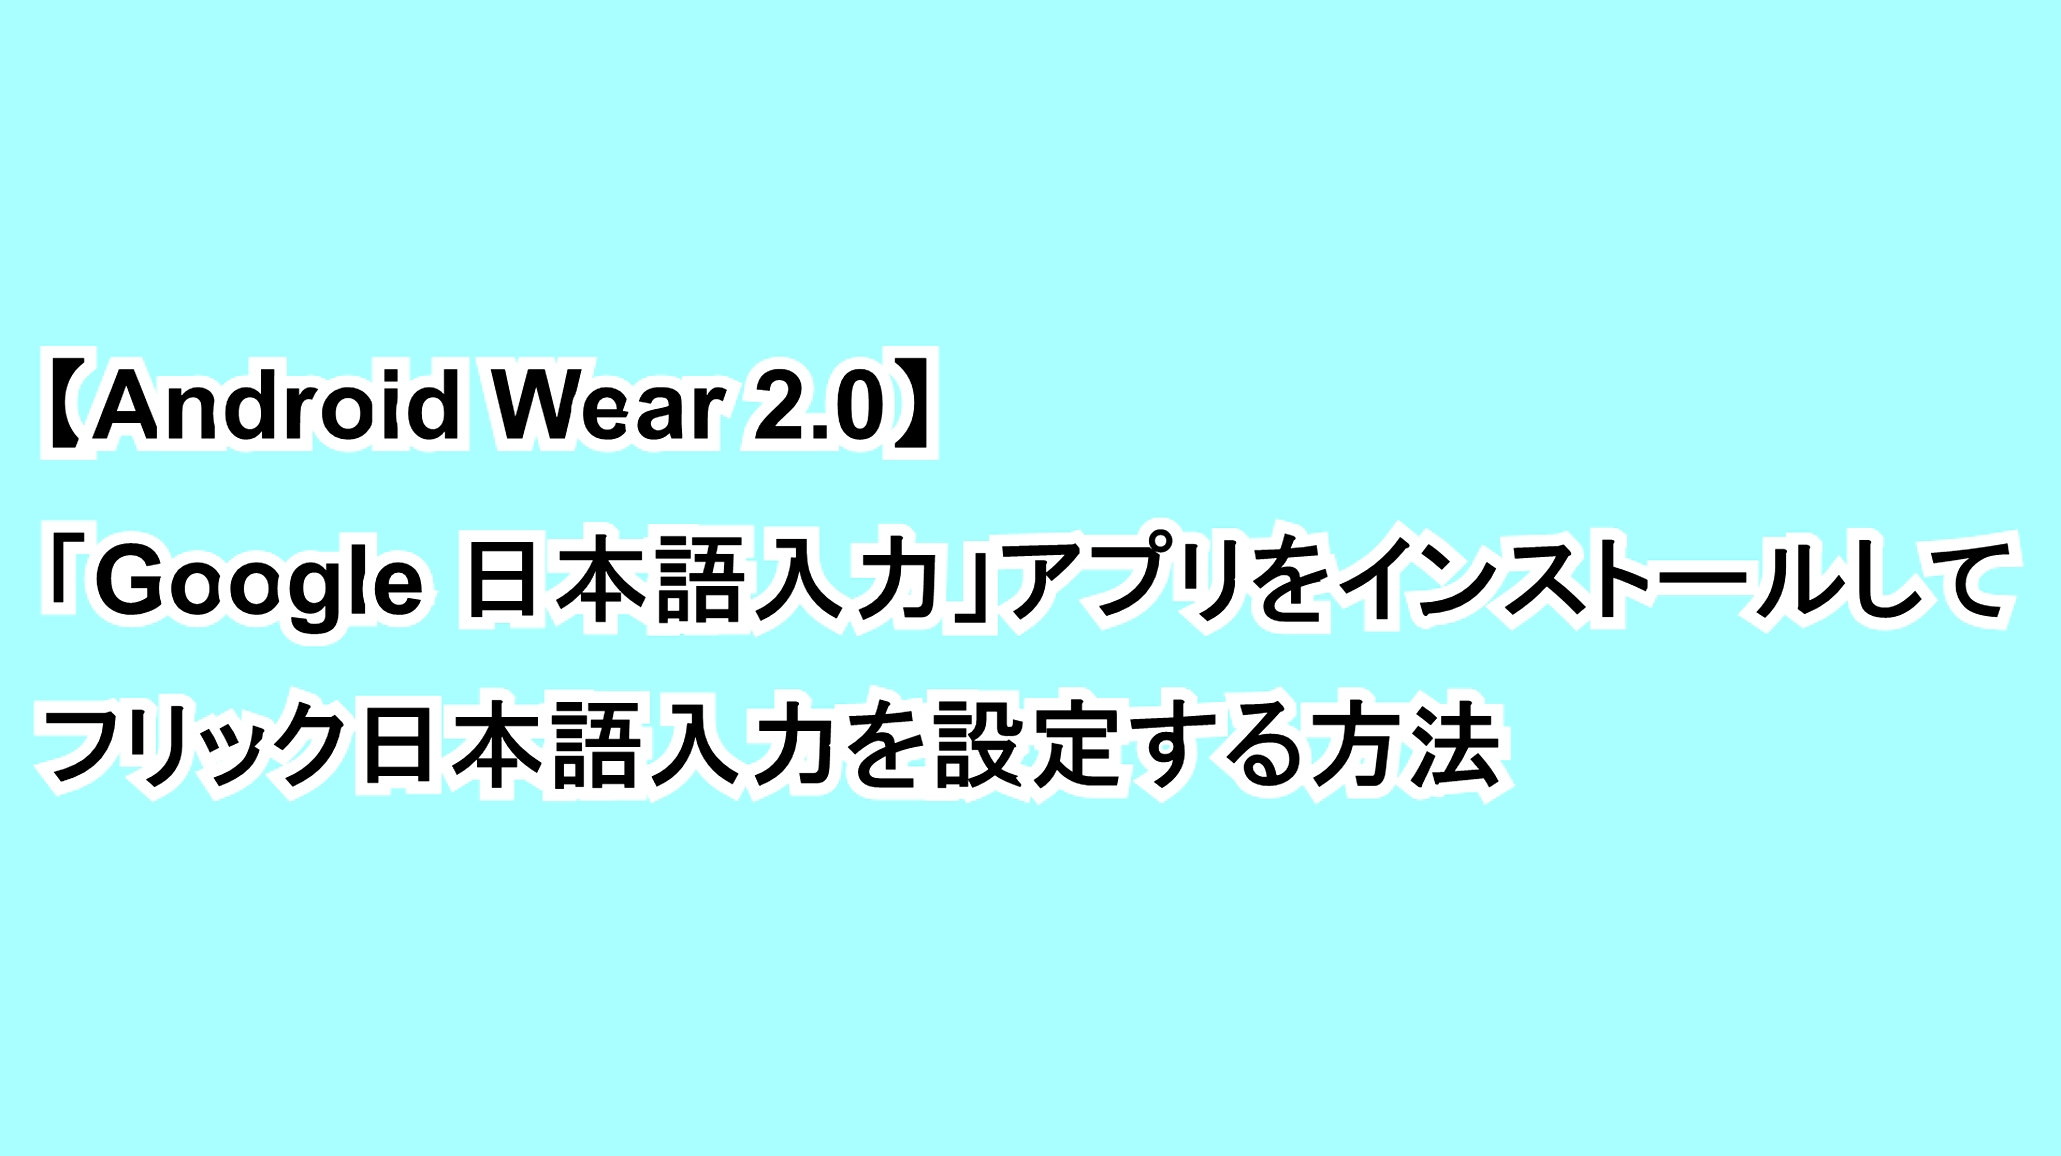 【Android Wear 2.0】「Google 日本語入力」アプリをインストールしてフリック日本語入力を設定する方法